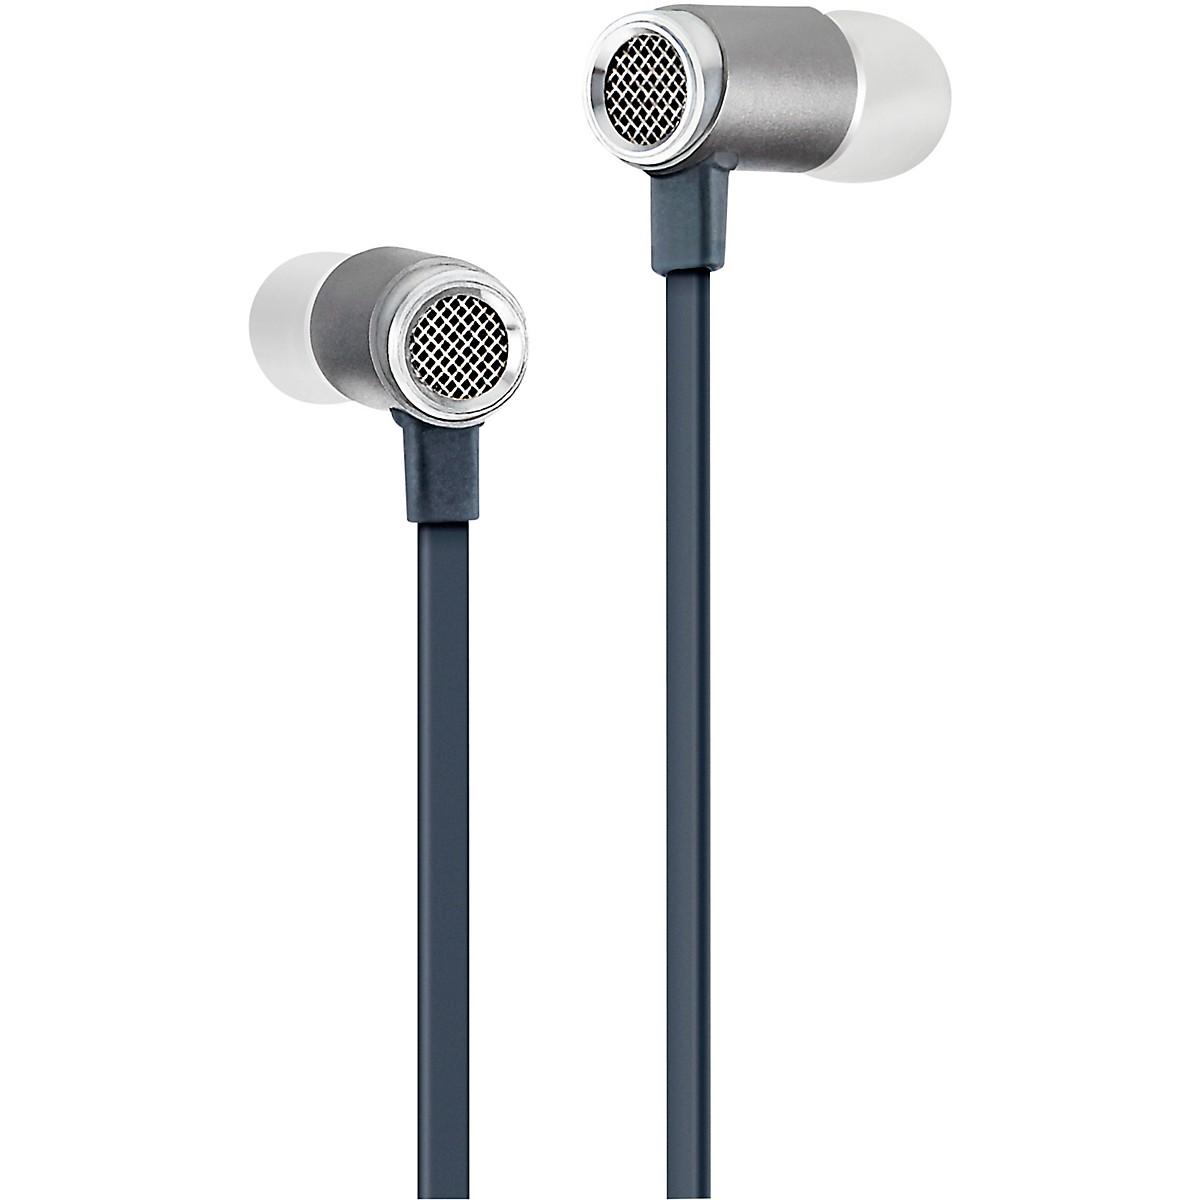 Master & Dynamic ME03 In Ear Headphone